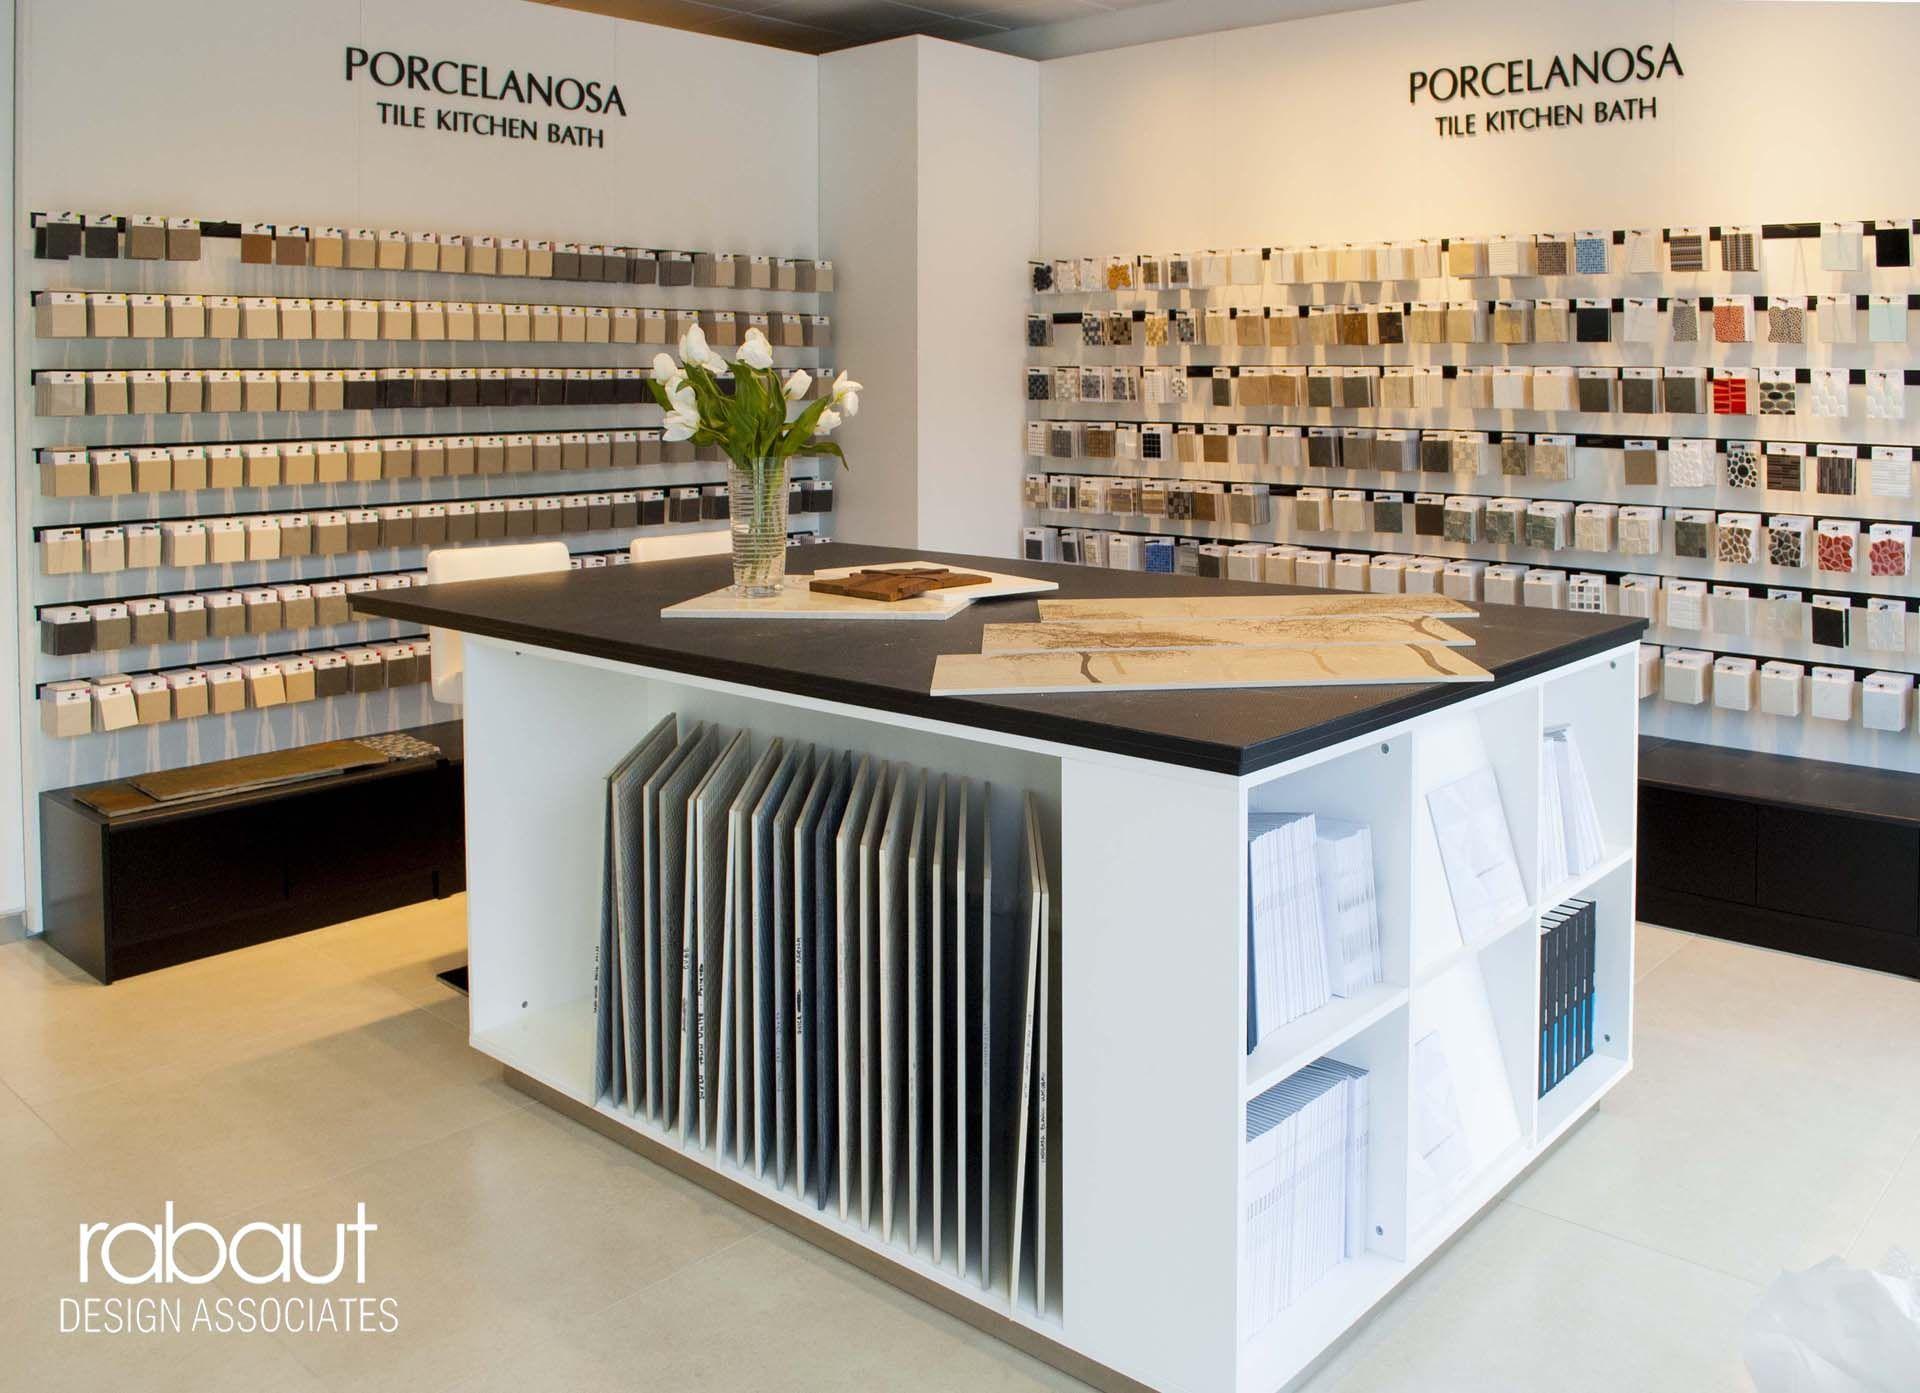 Porcelanosa Showroom By Rabaut Design Associates Showroom